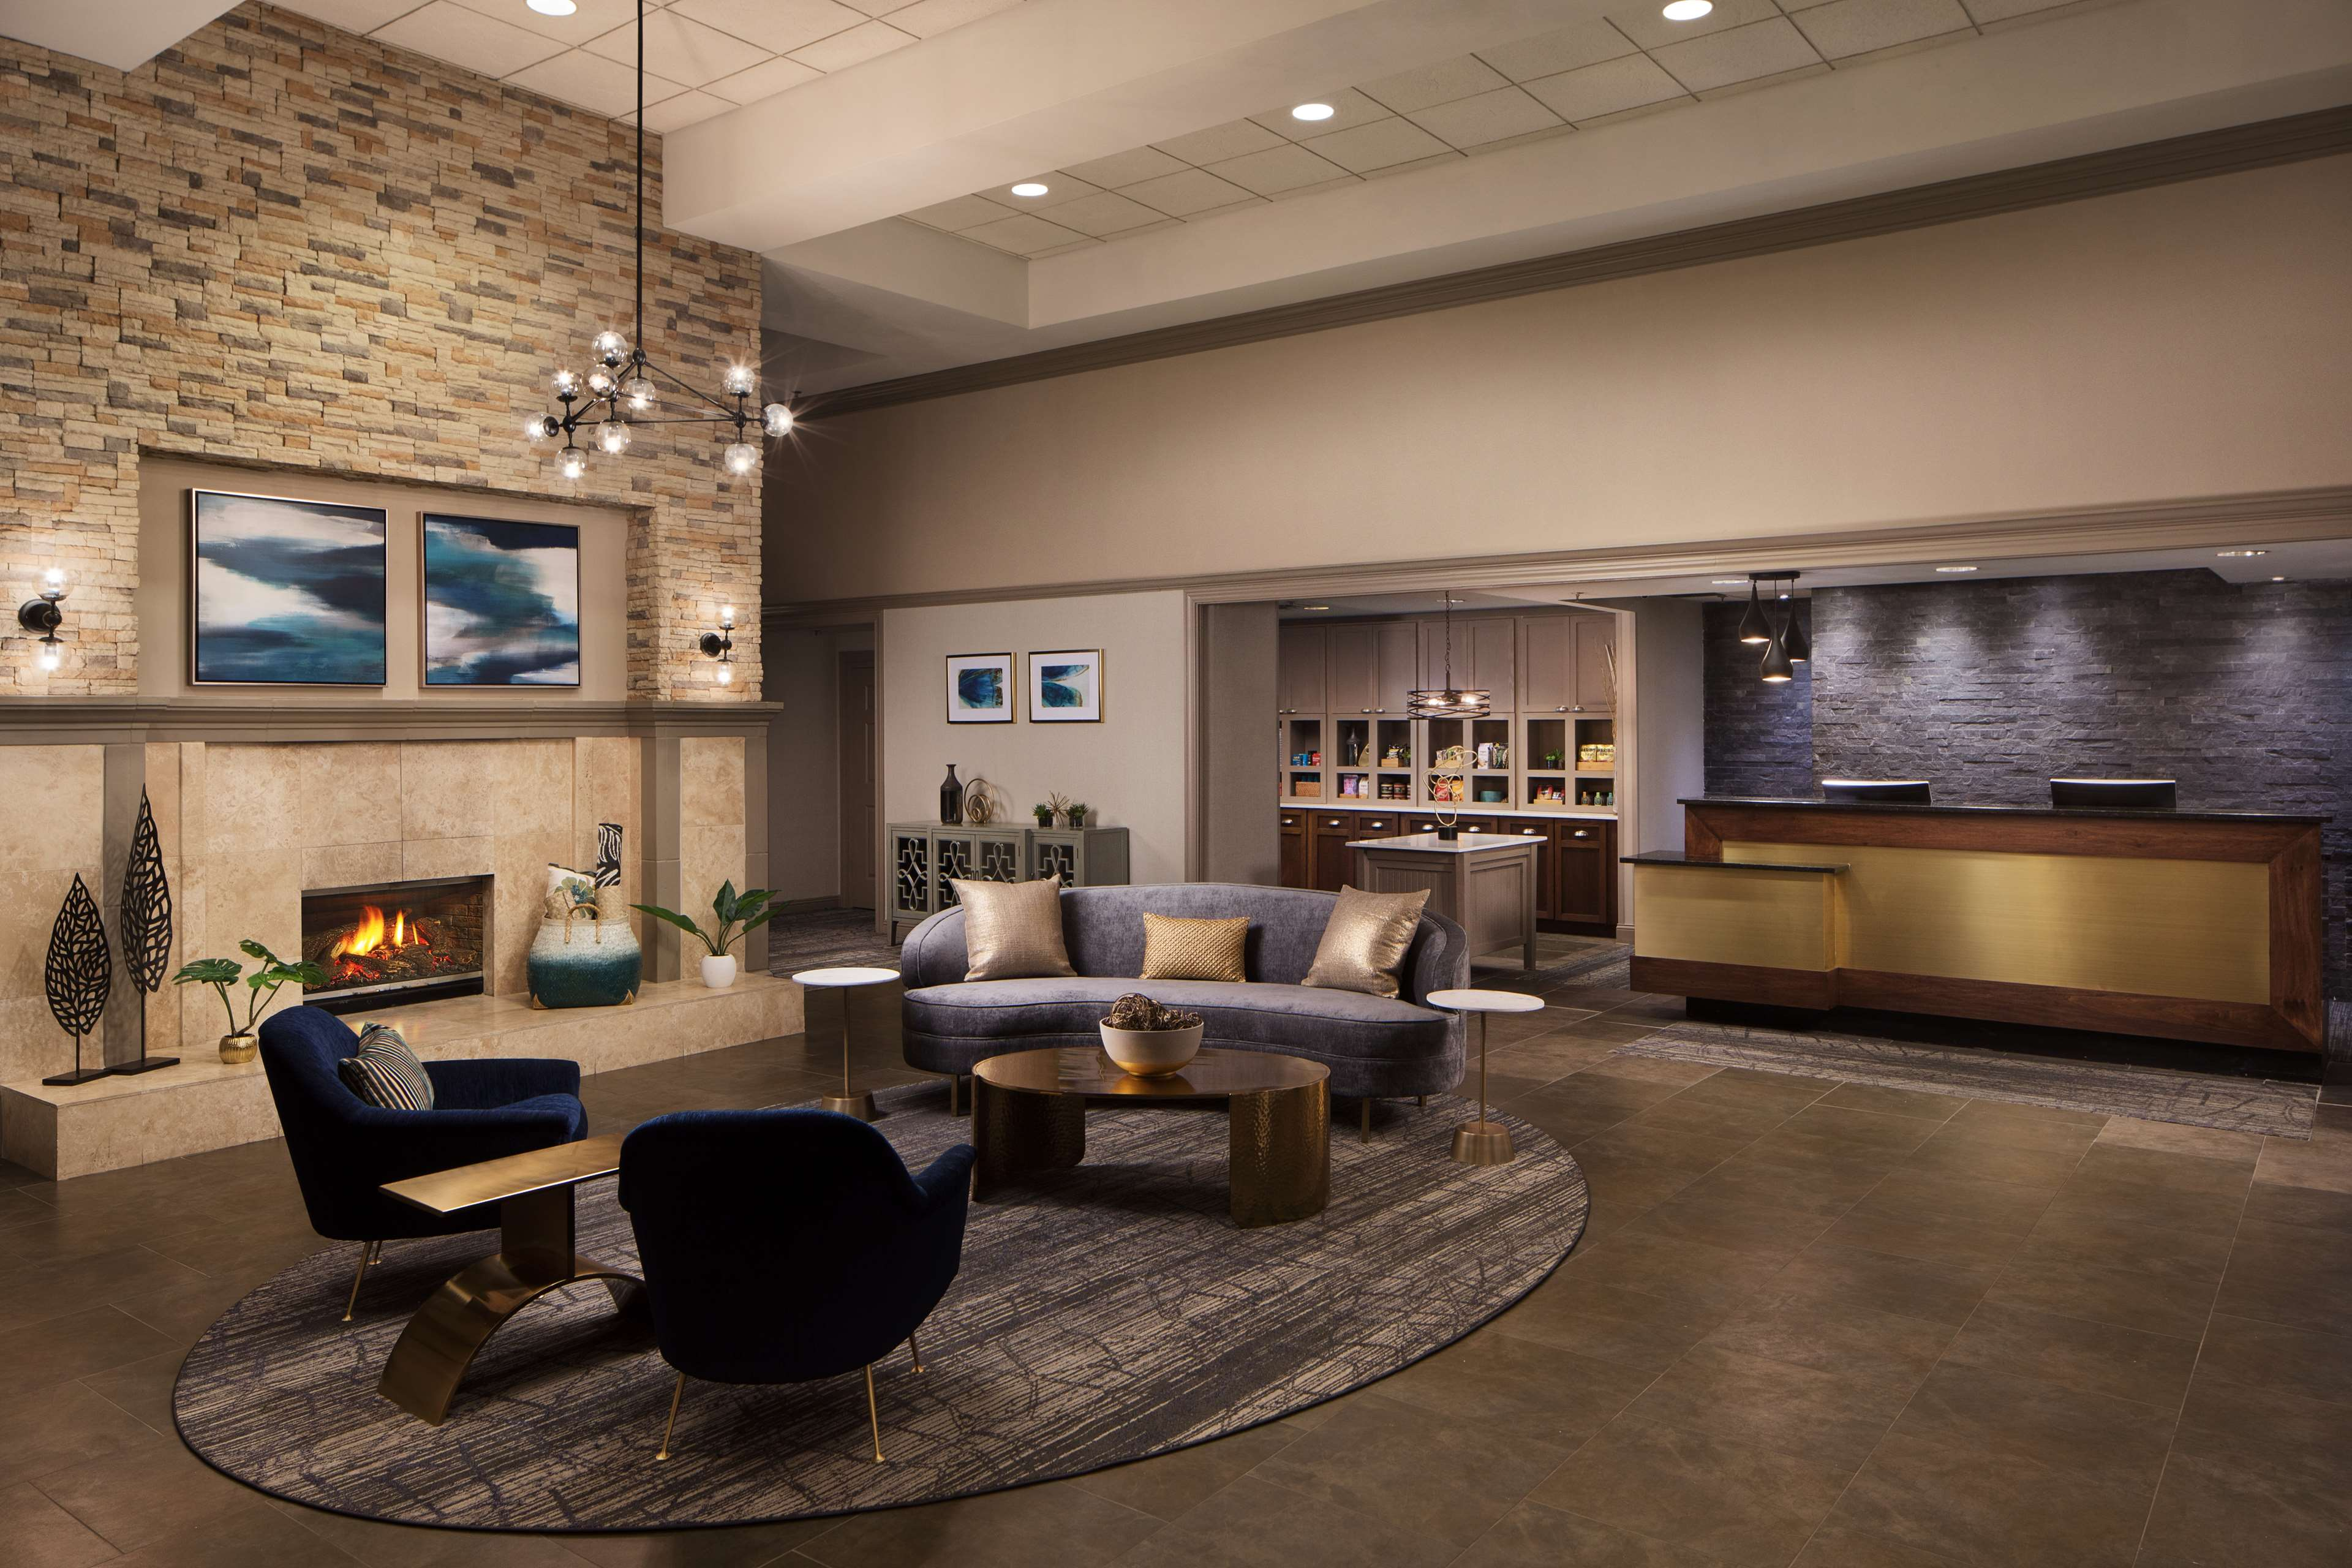 Homewood Suites by Hilton Lubbock image 6